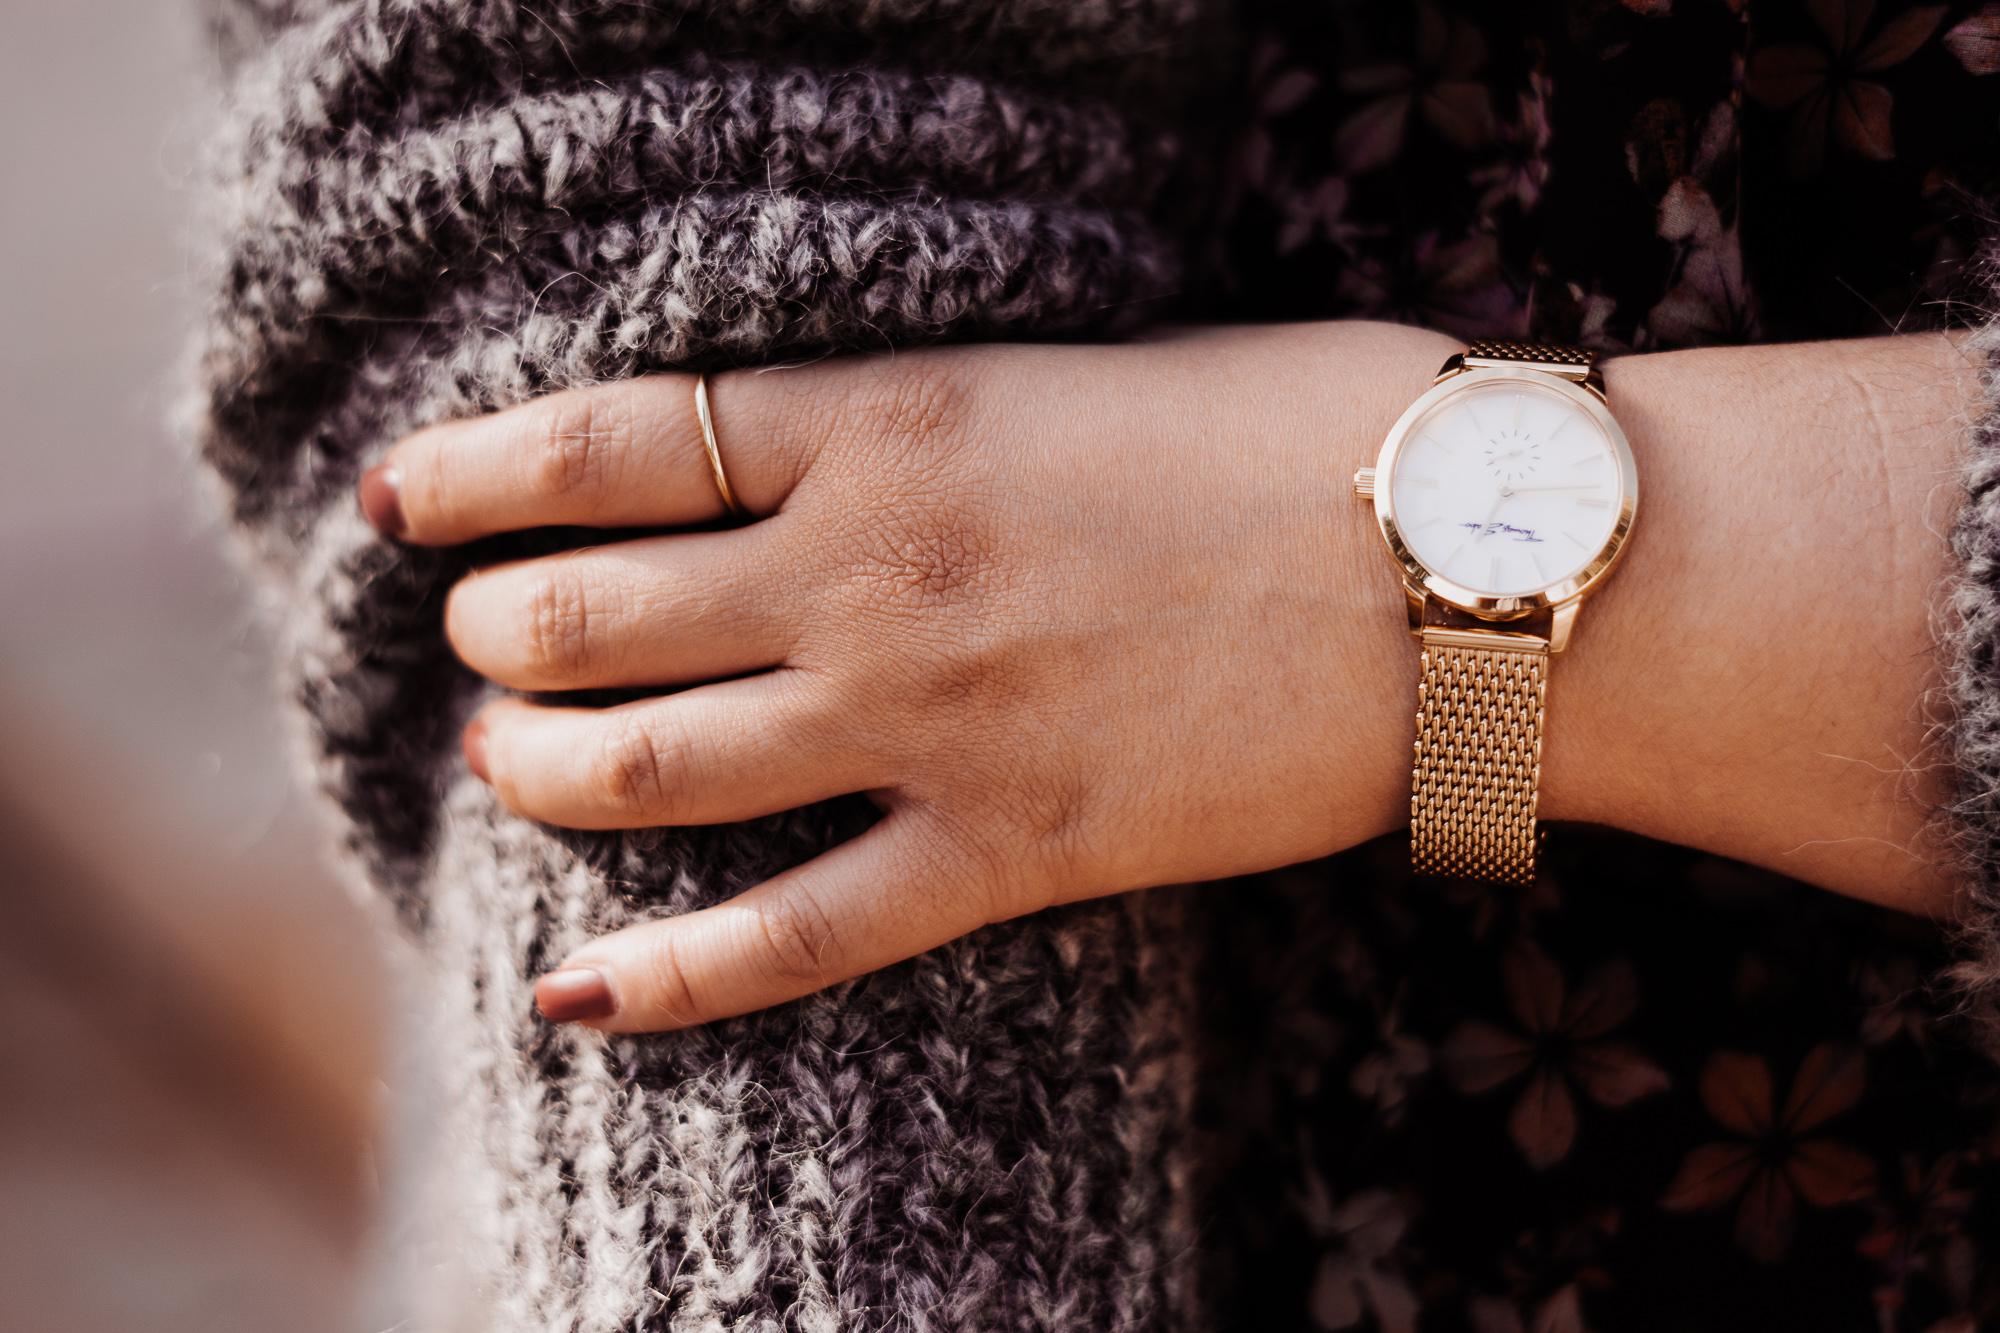 ketten-layering-trend-thomas-sabo-modeblog-infatstyle-fashionblog-plussize-blog-schmuck-trend-oktober-2018-gold-ketten-outfit-uhr